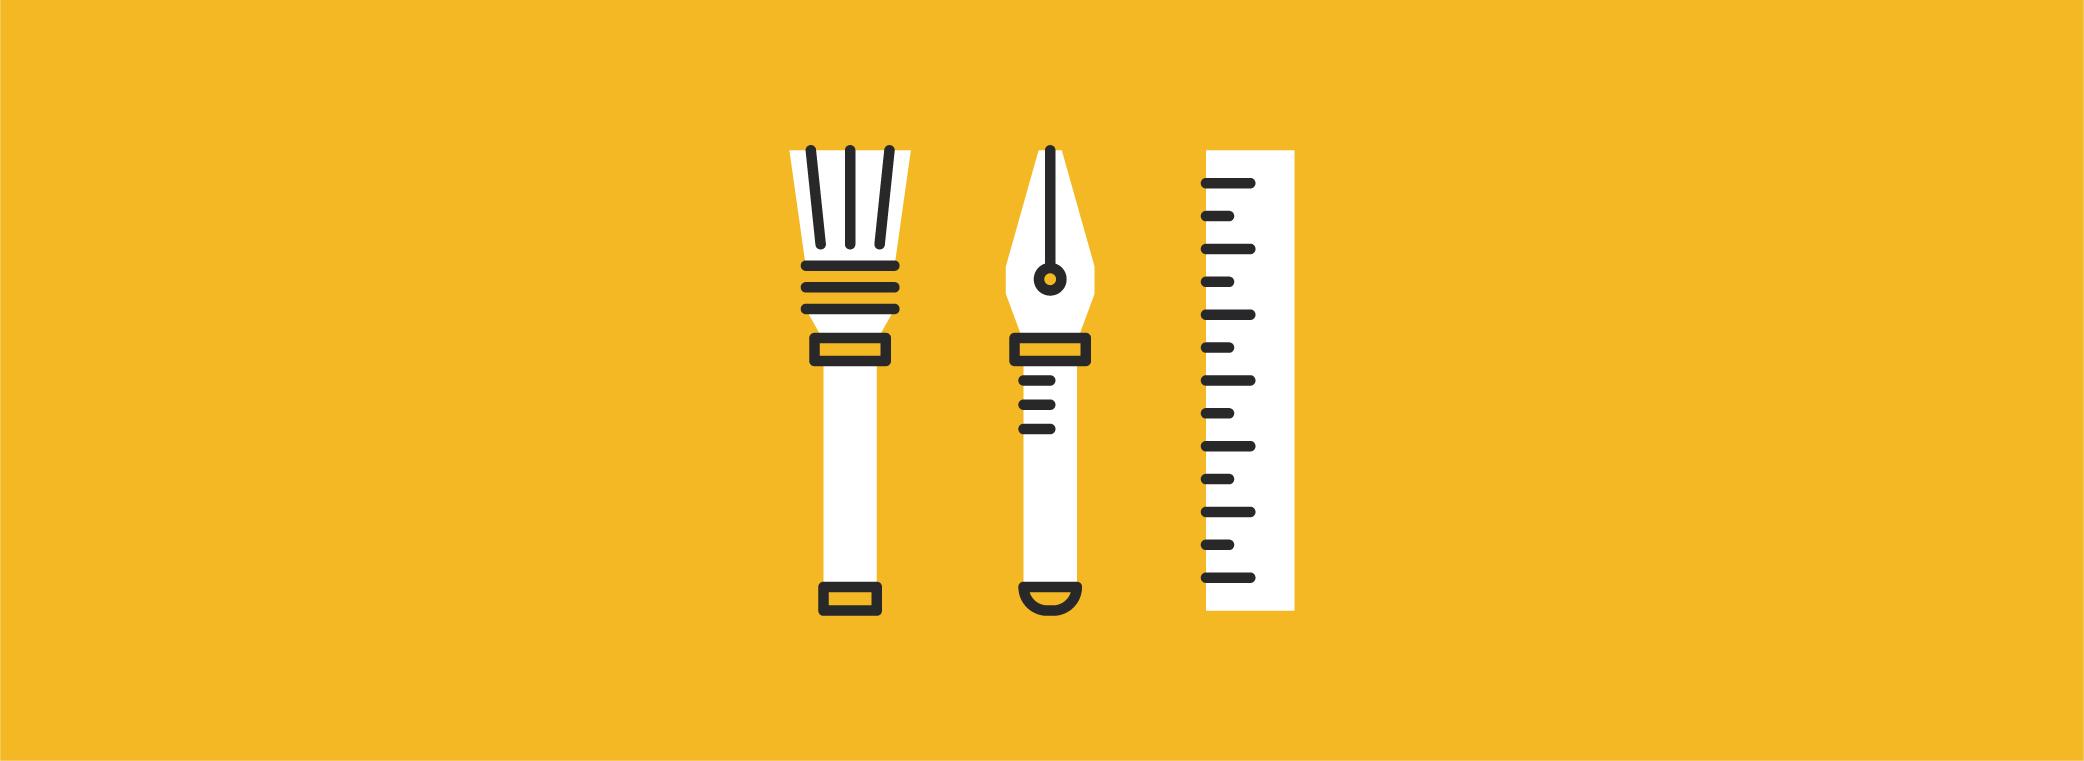 5 tips for developing a better newsletter format emma